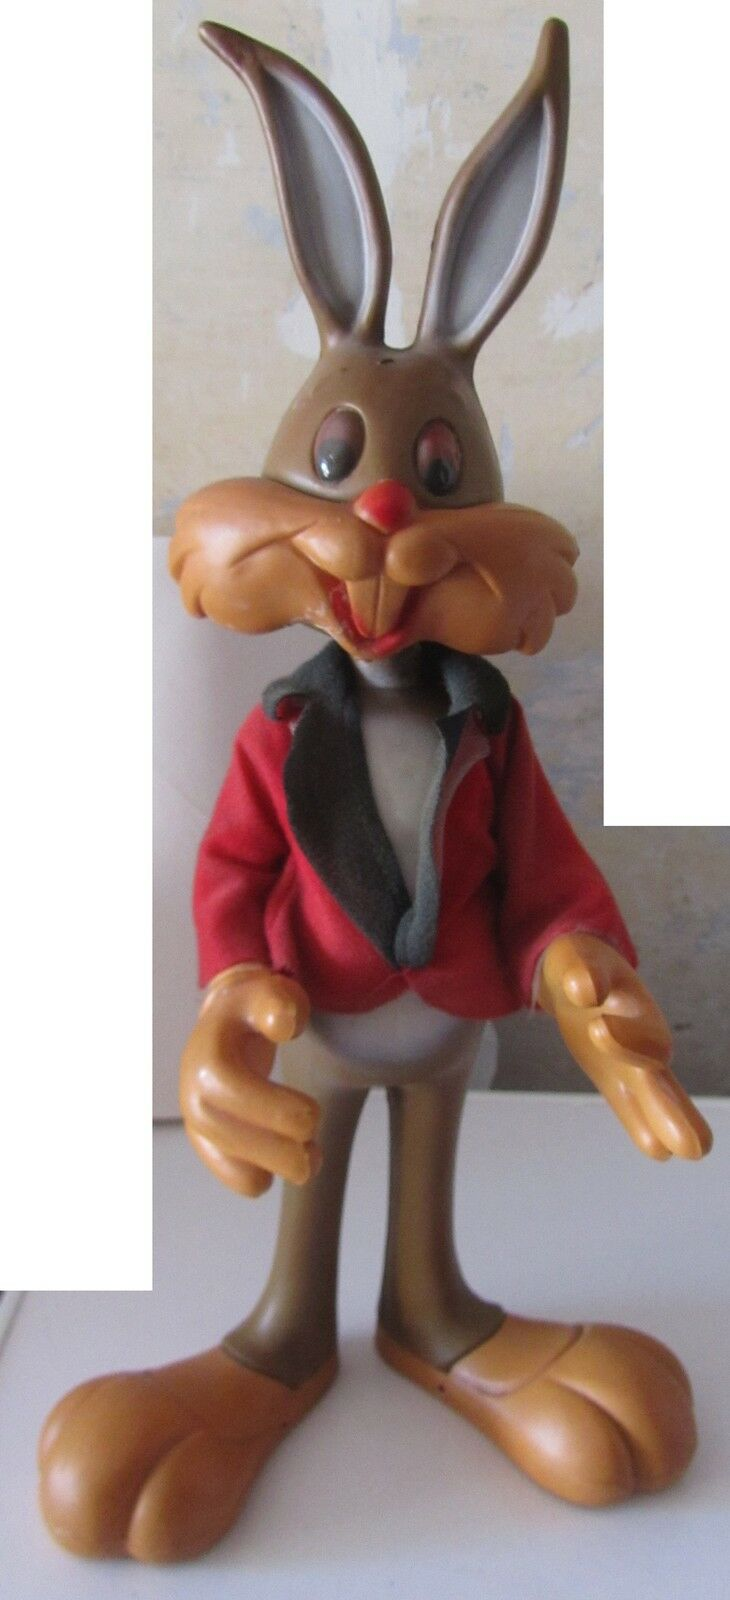 Bugs Bunny Sperlari Pubblicitario bubble head testa a molla SPESE GRATIS